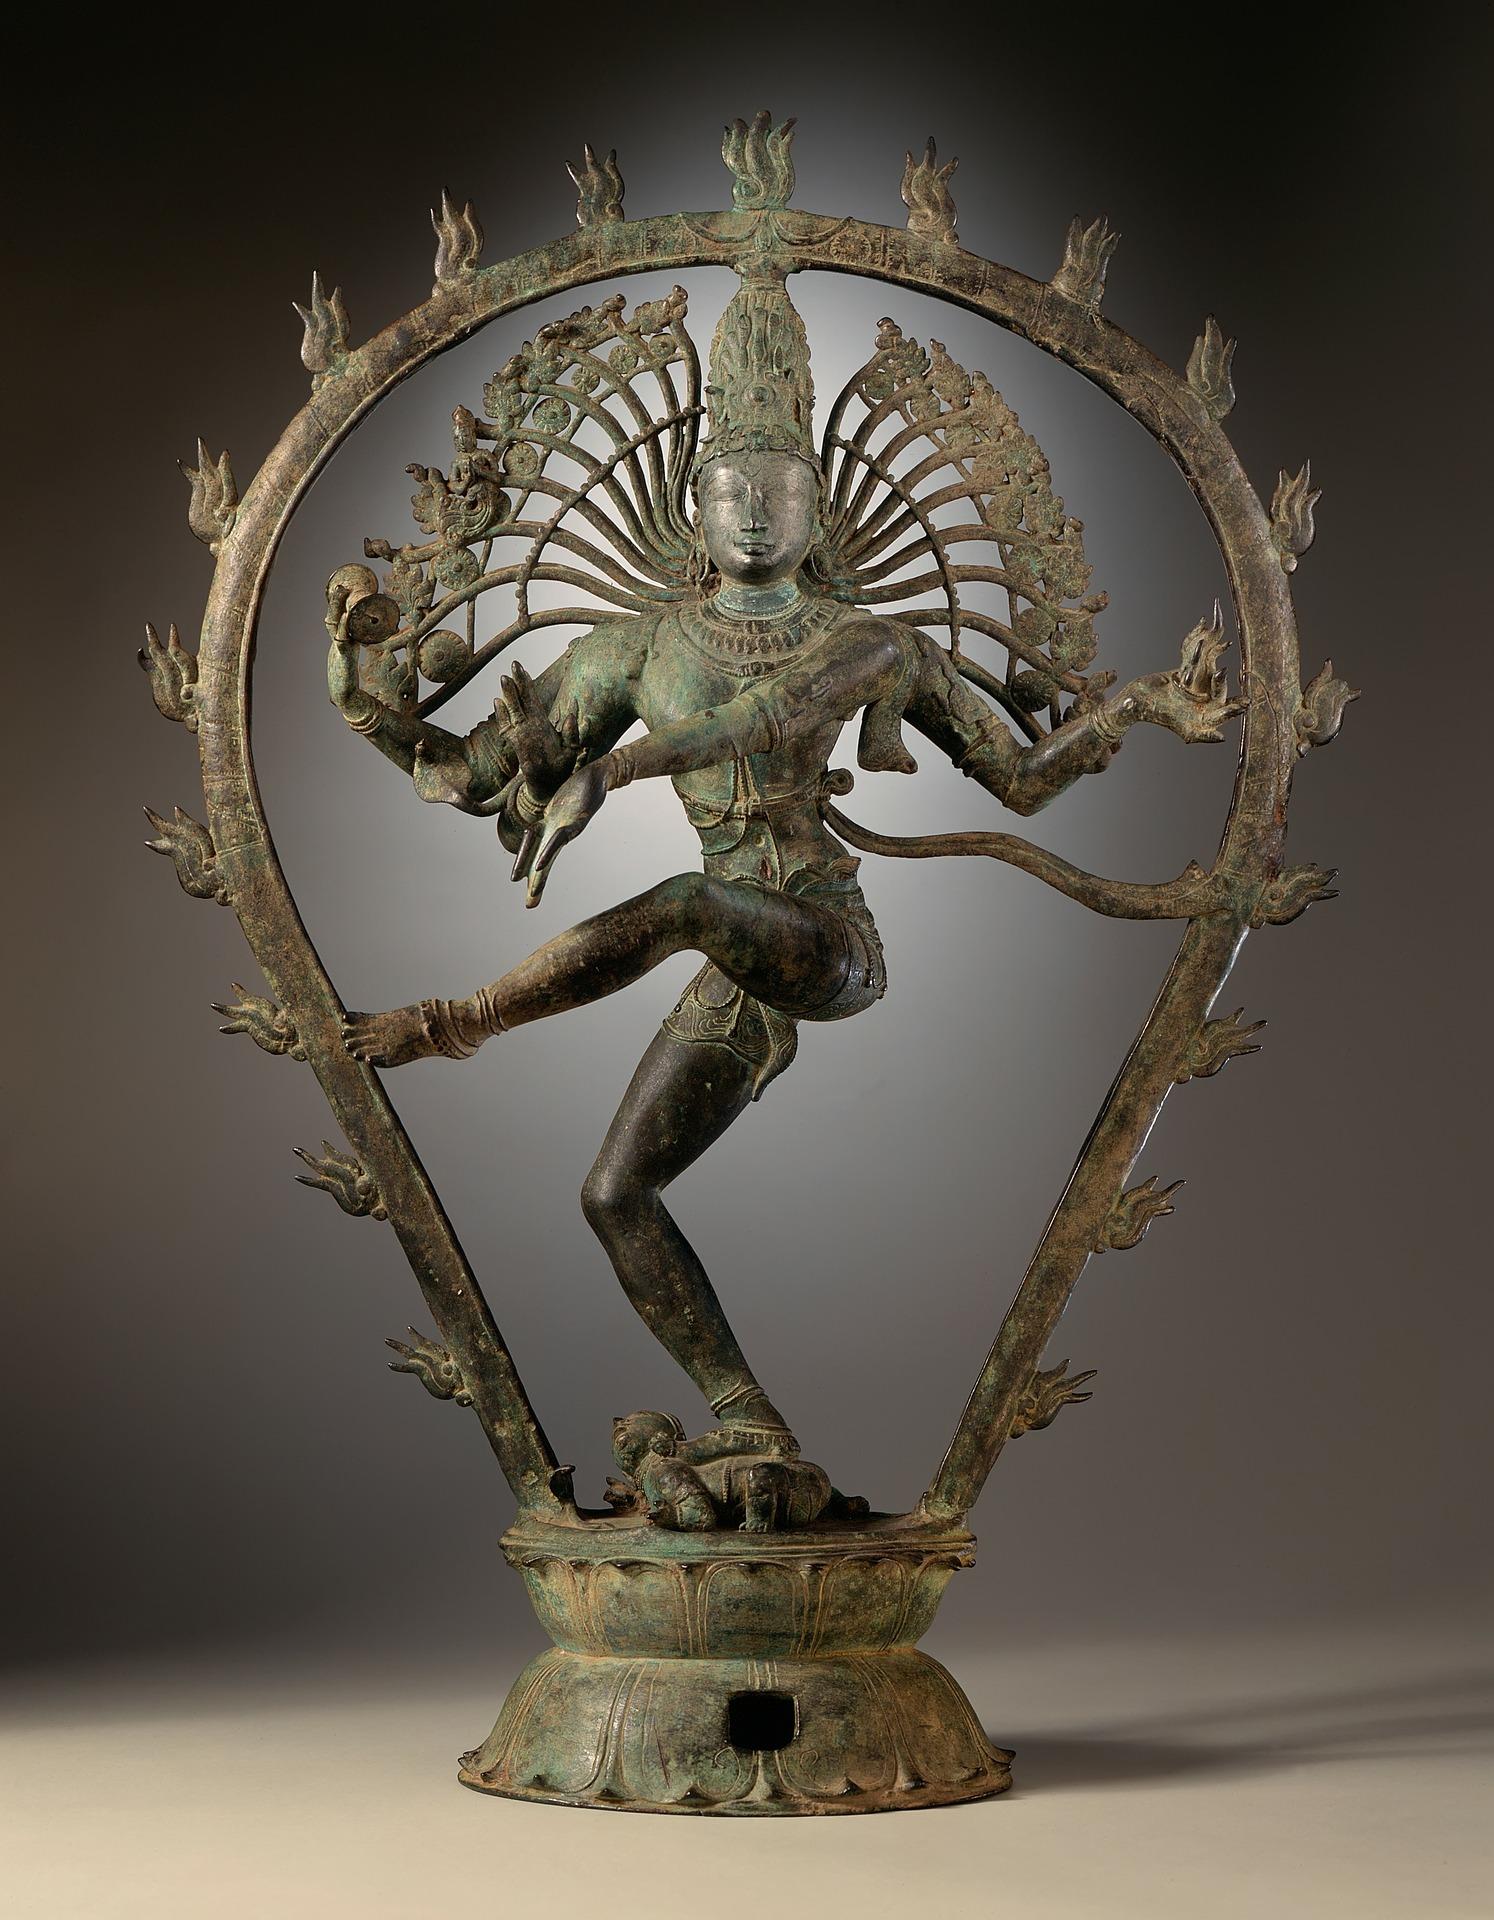 Shiva as the cosmic dancer